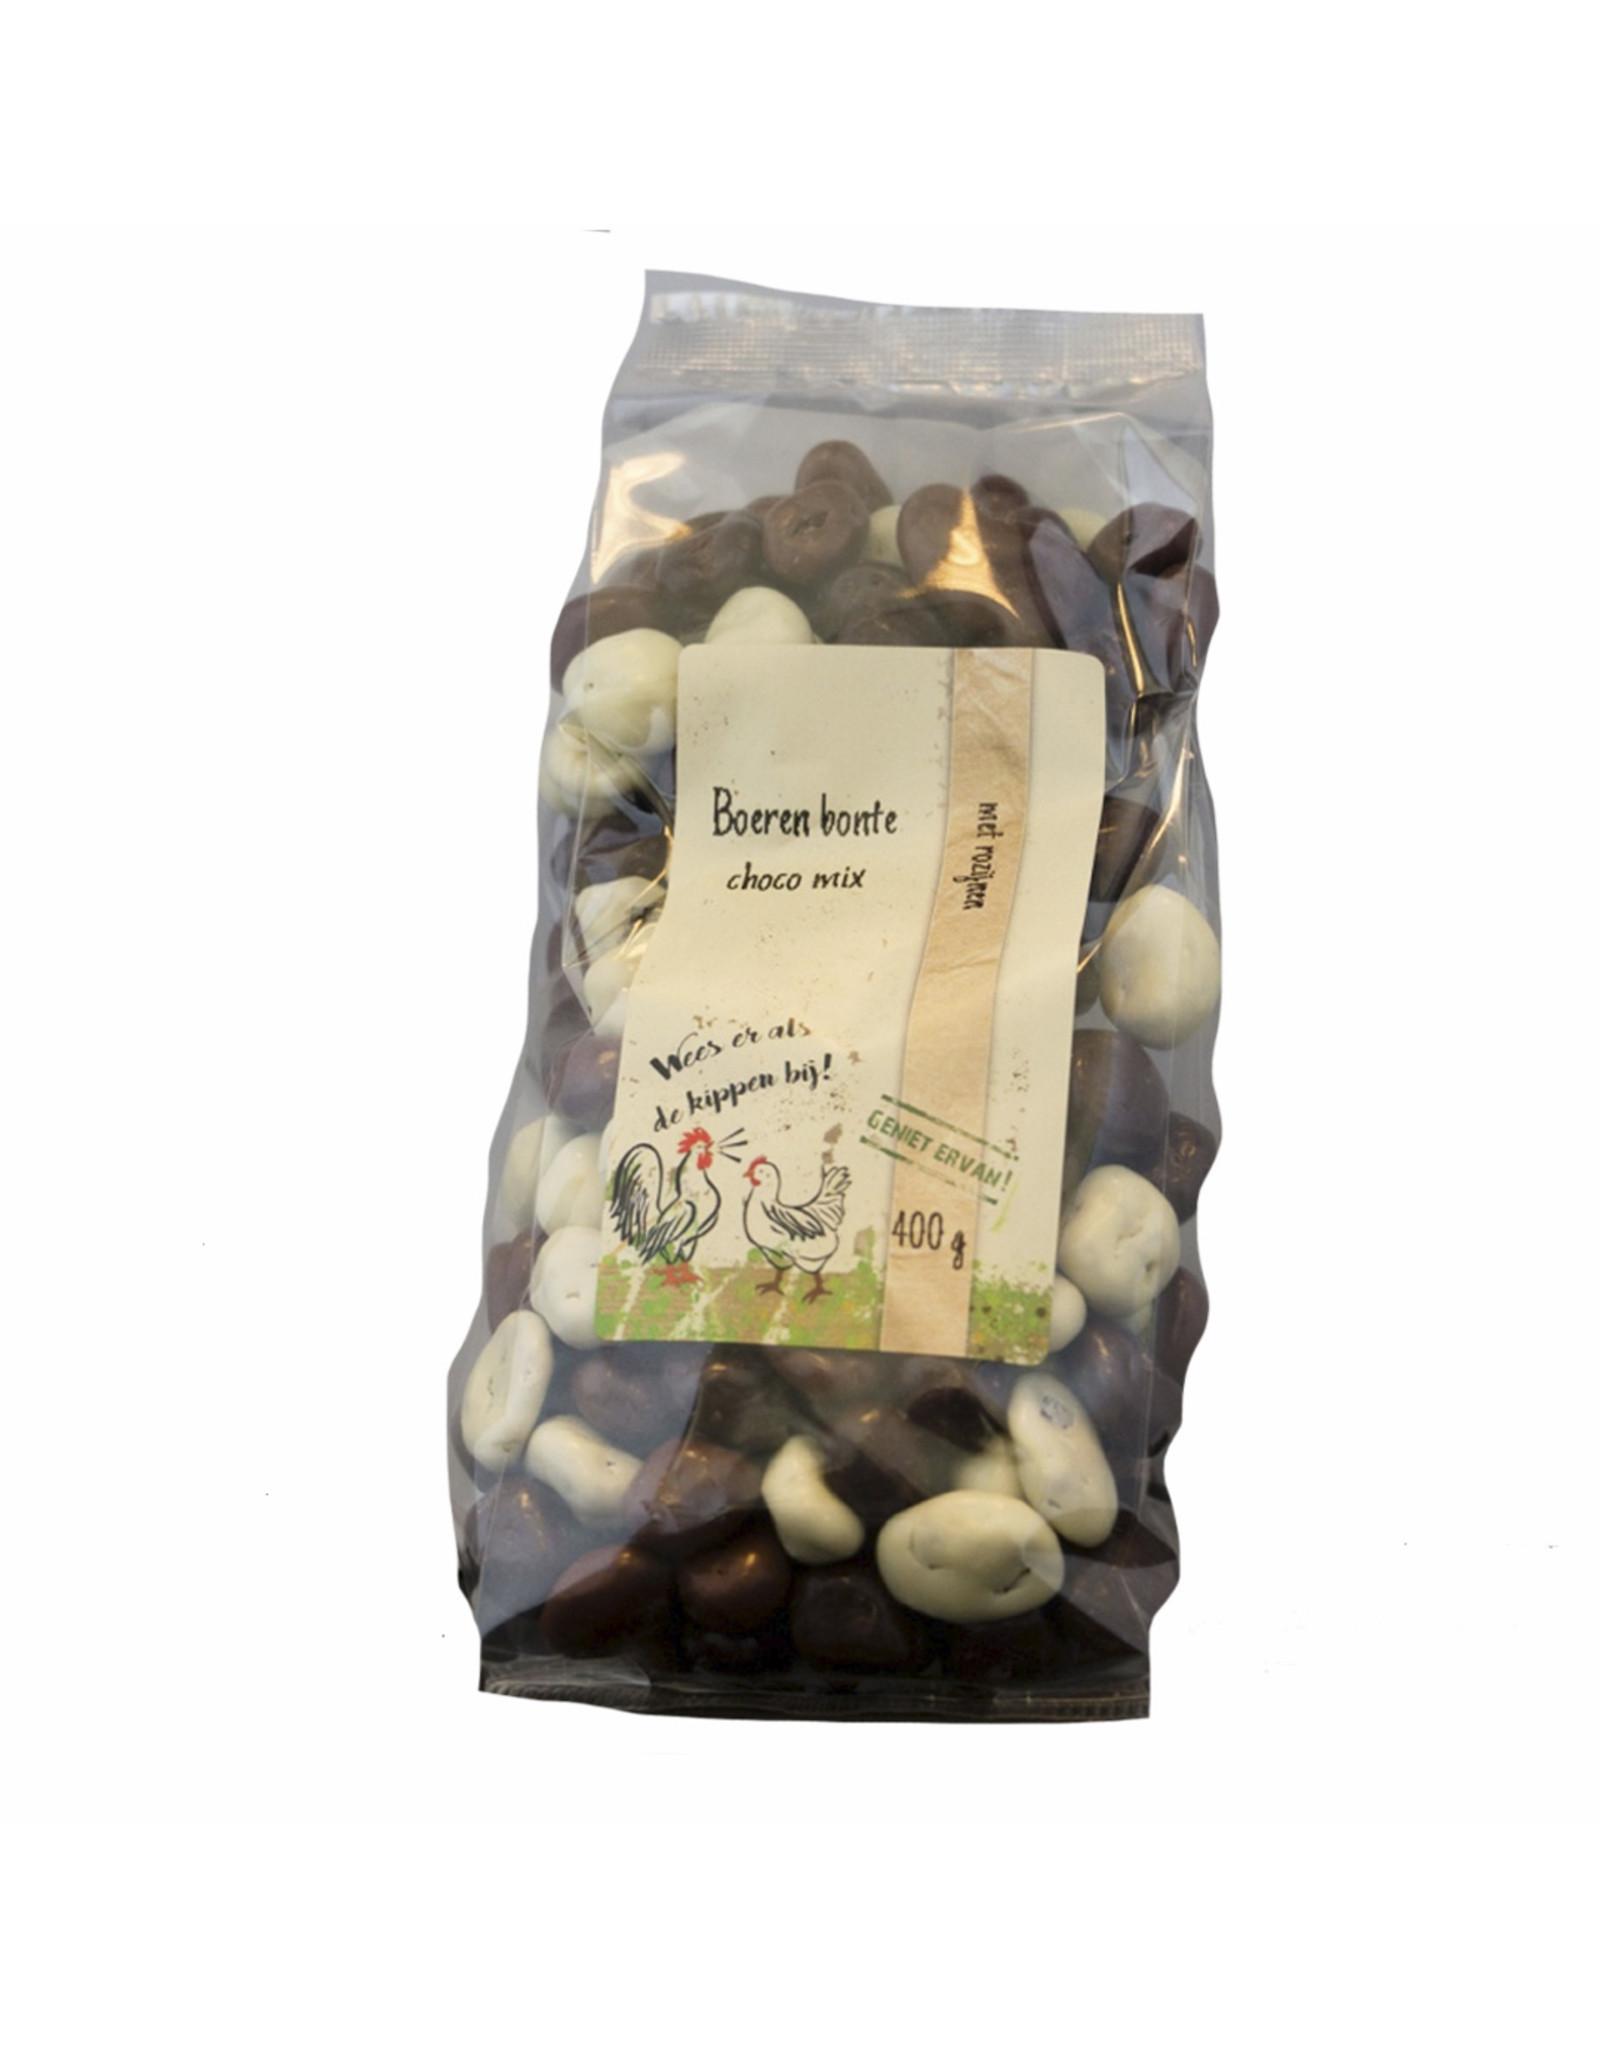 Landwinkel Boeren bonte choco mix rozijnen 400 gr